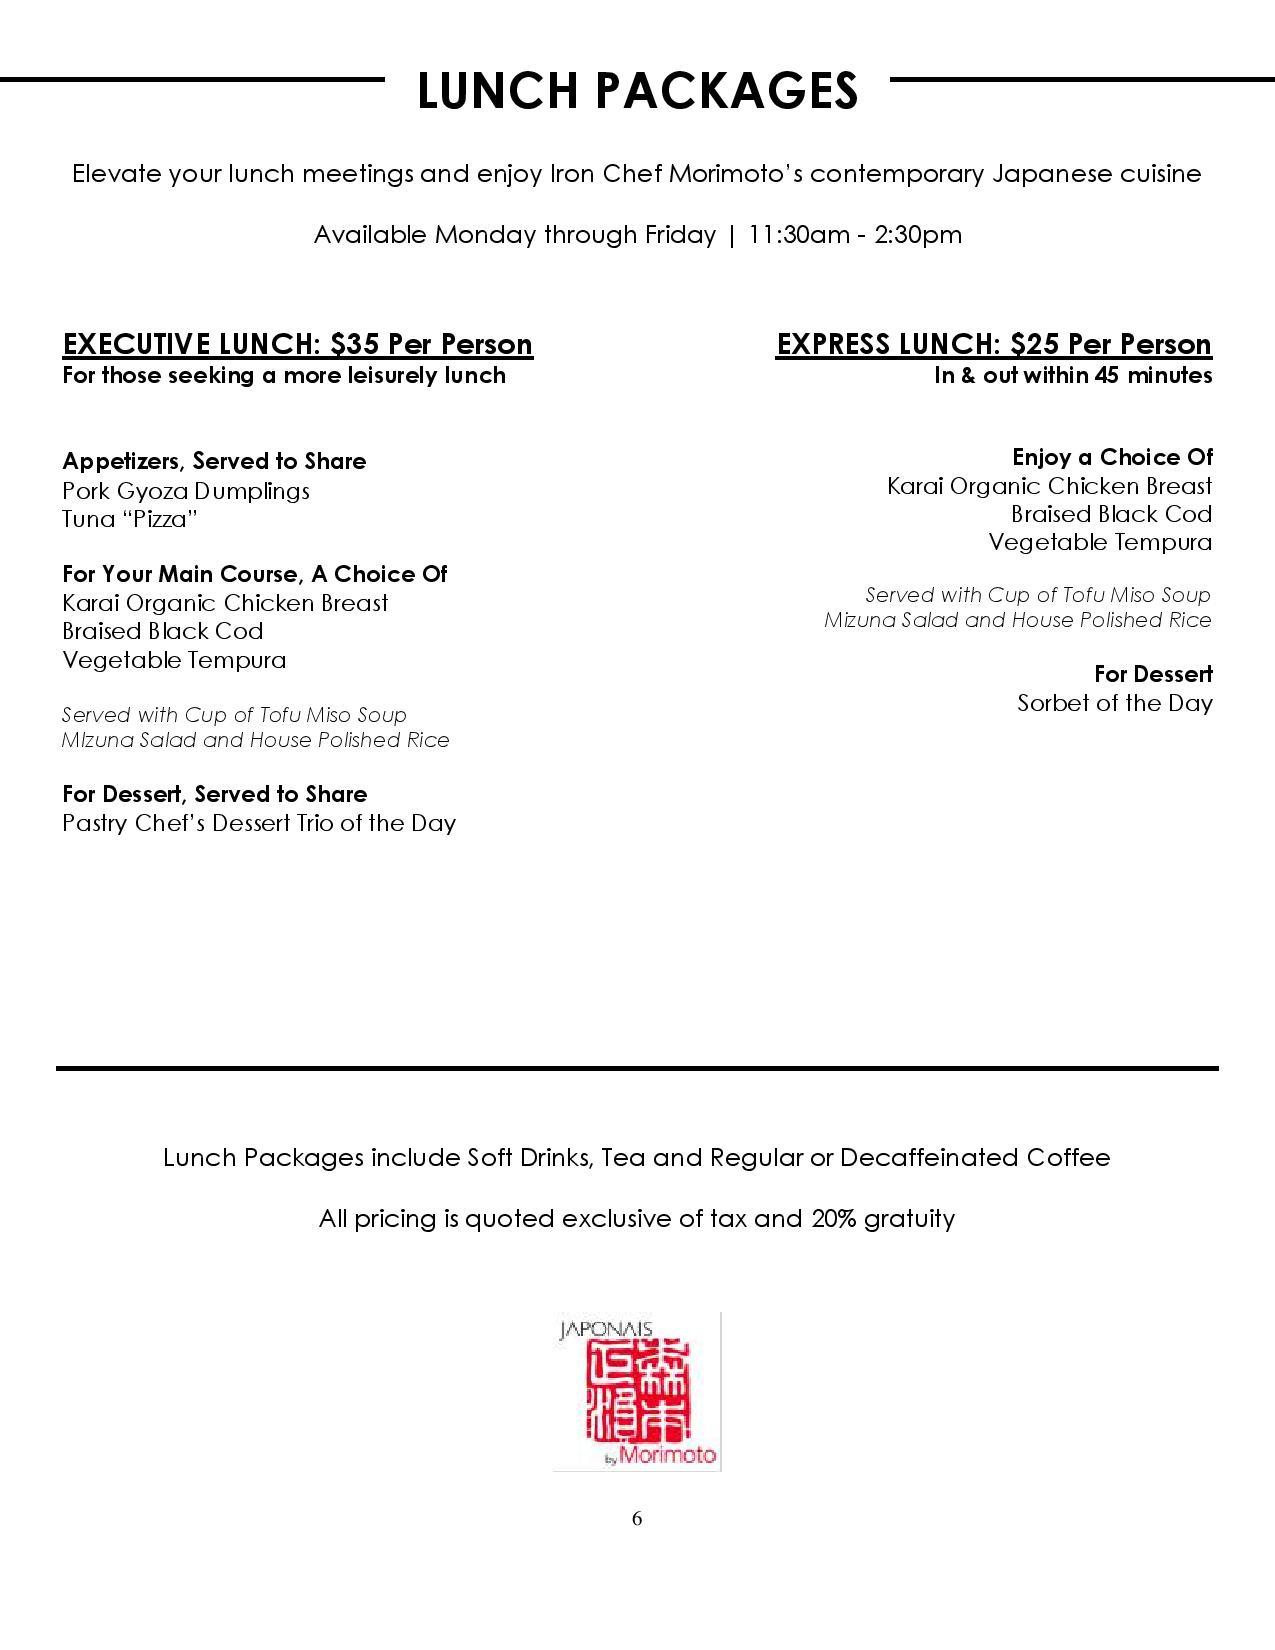 PrivateDining2015 (1)-page-006